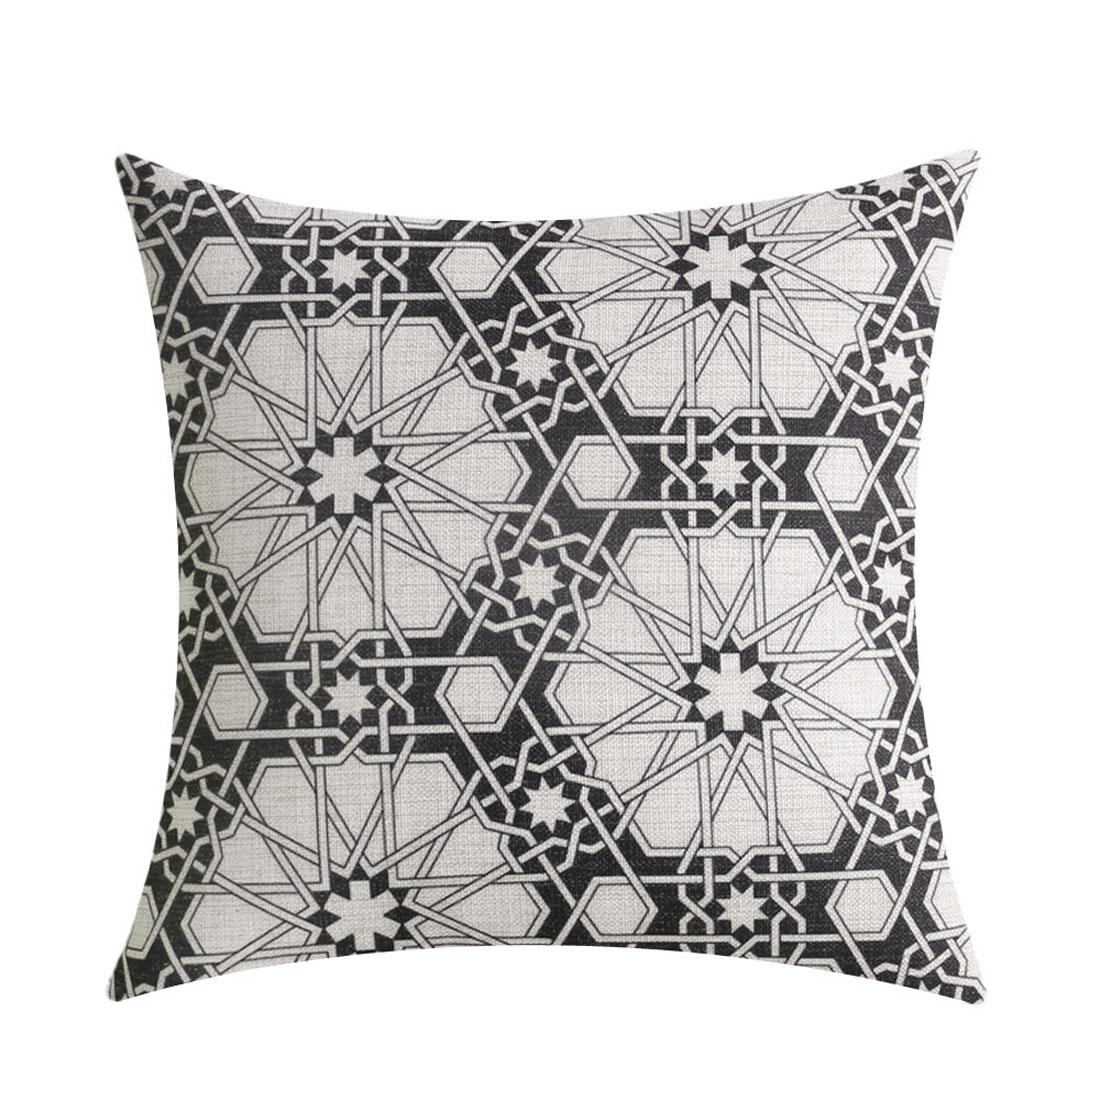 Car Seat Sofa Cotton Linen Geometric Pattern Waist Throw Cushion Cover Pillow Case